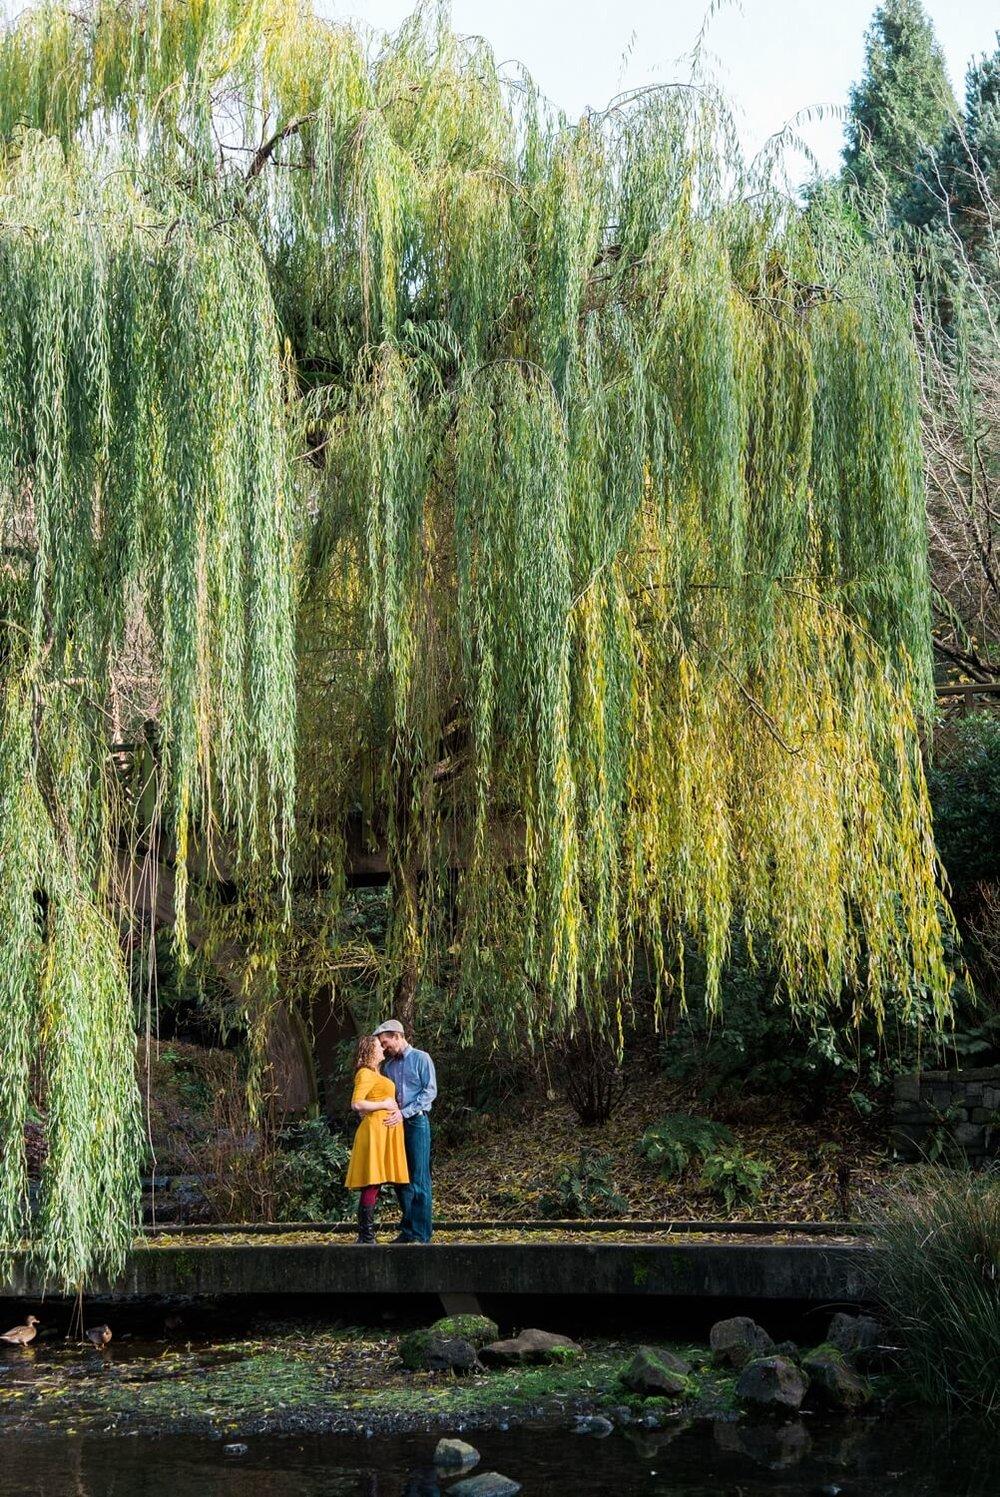 portland-maternity-crystal-springs-rhododendron-garden-oregon-shelley-marie-photo-167_cr.jpg